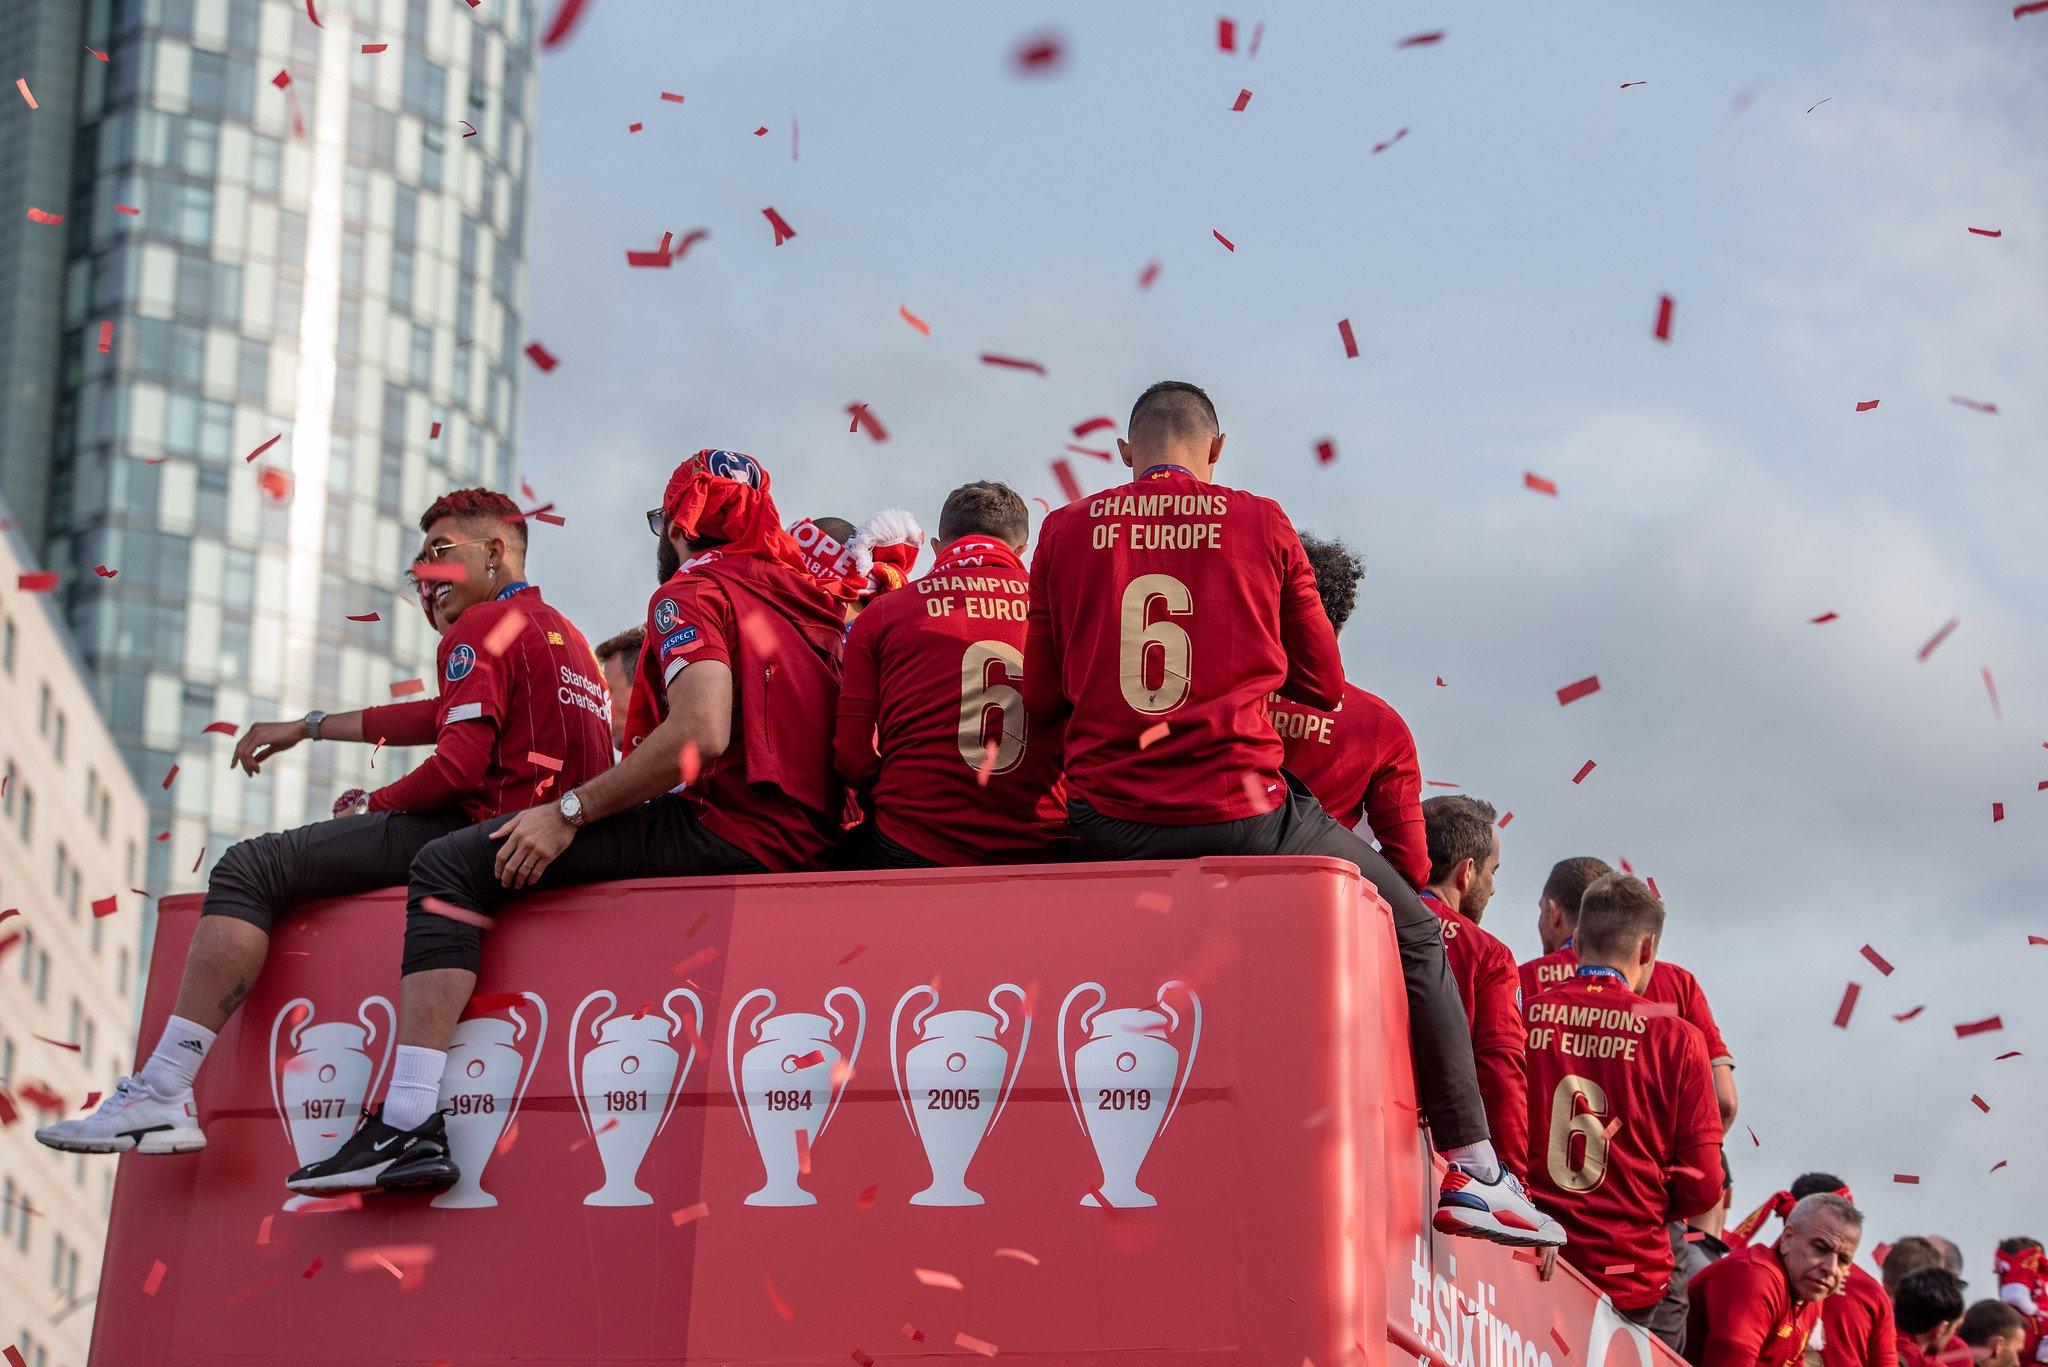 Liverpool F.C. News